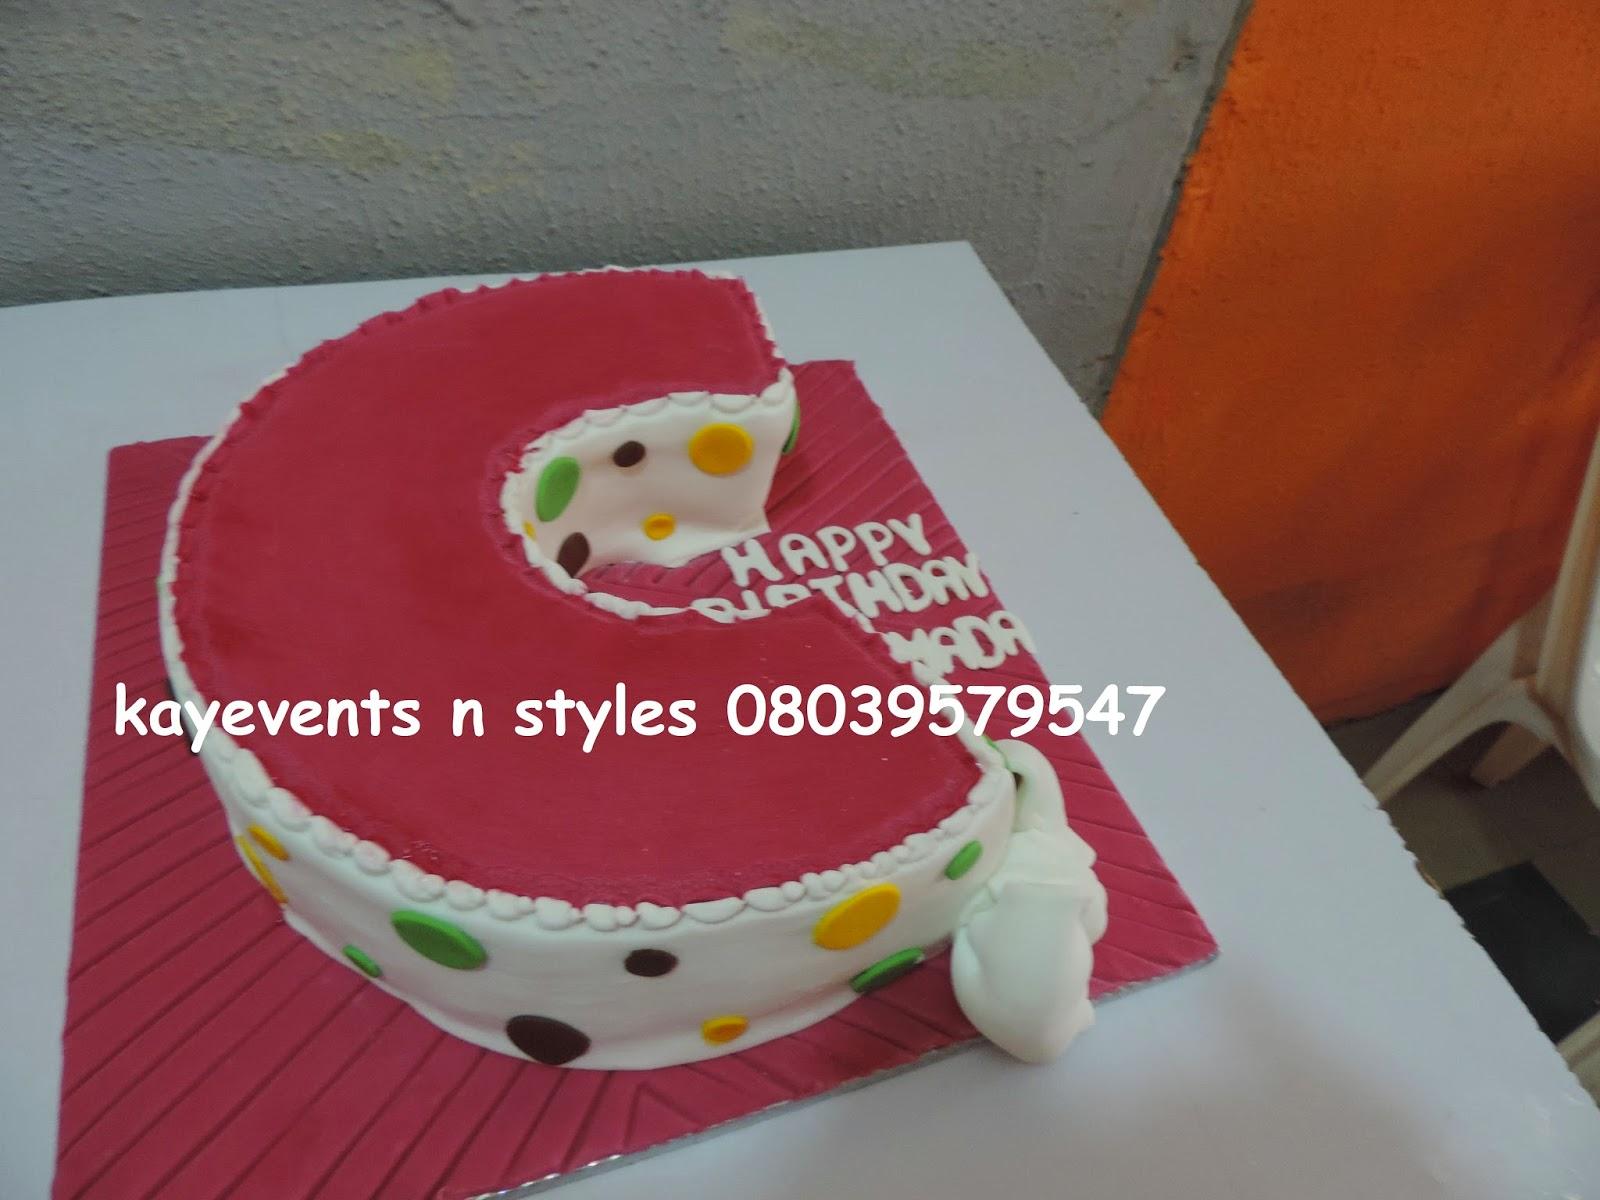 Kay Events N Styles Pastors Birthday Cake